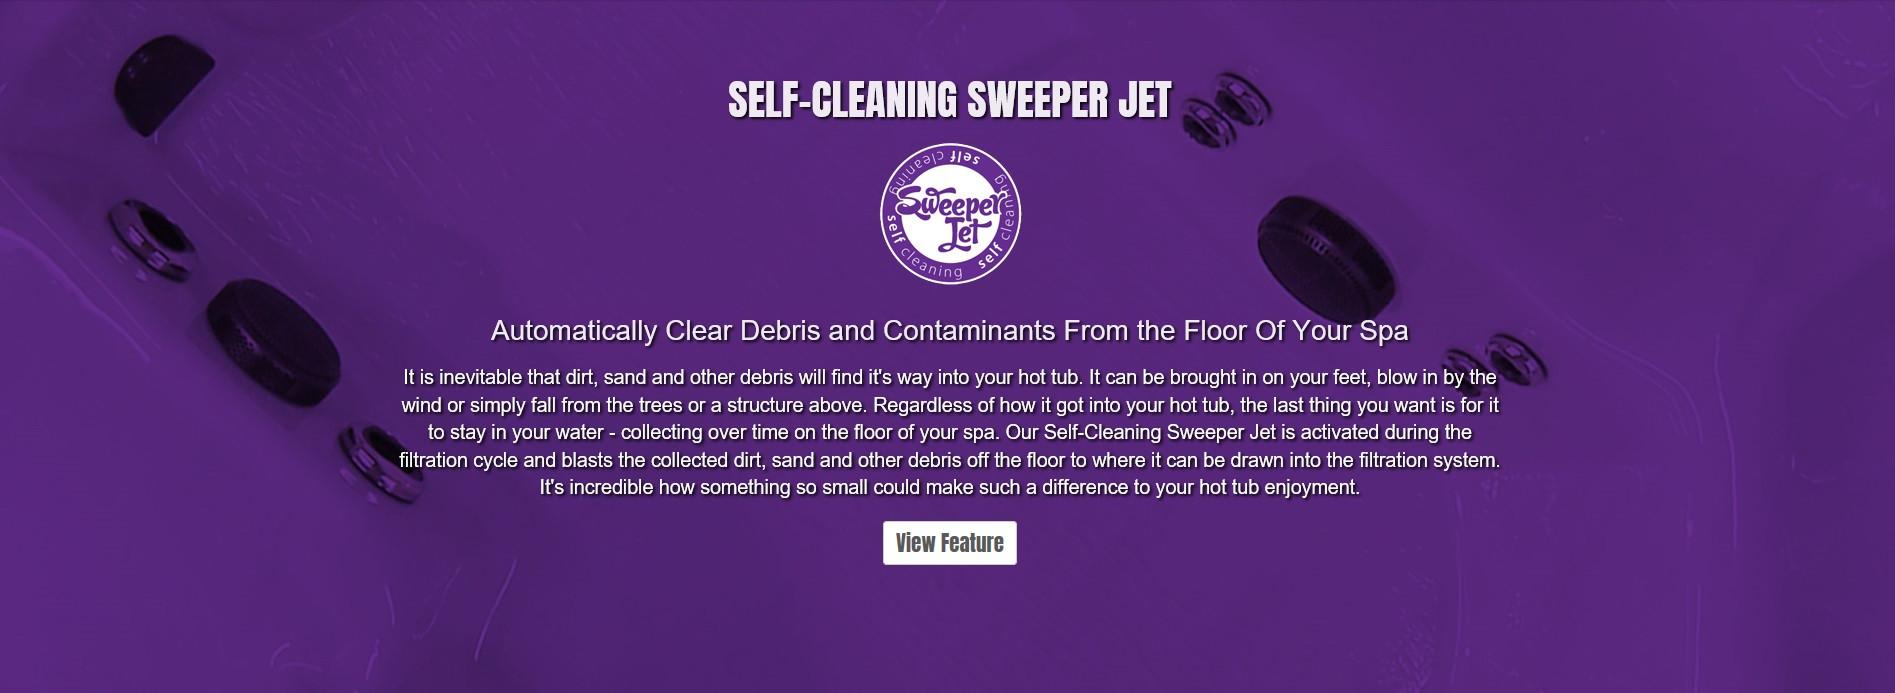 SweeperJet.jpg